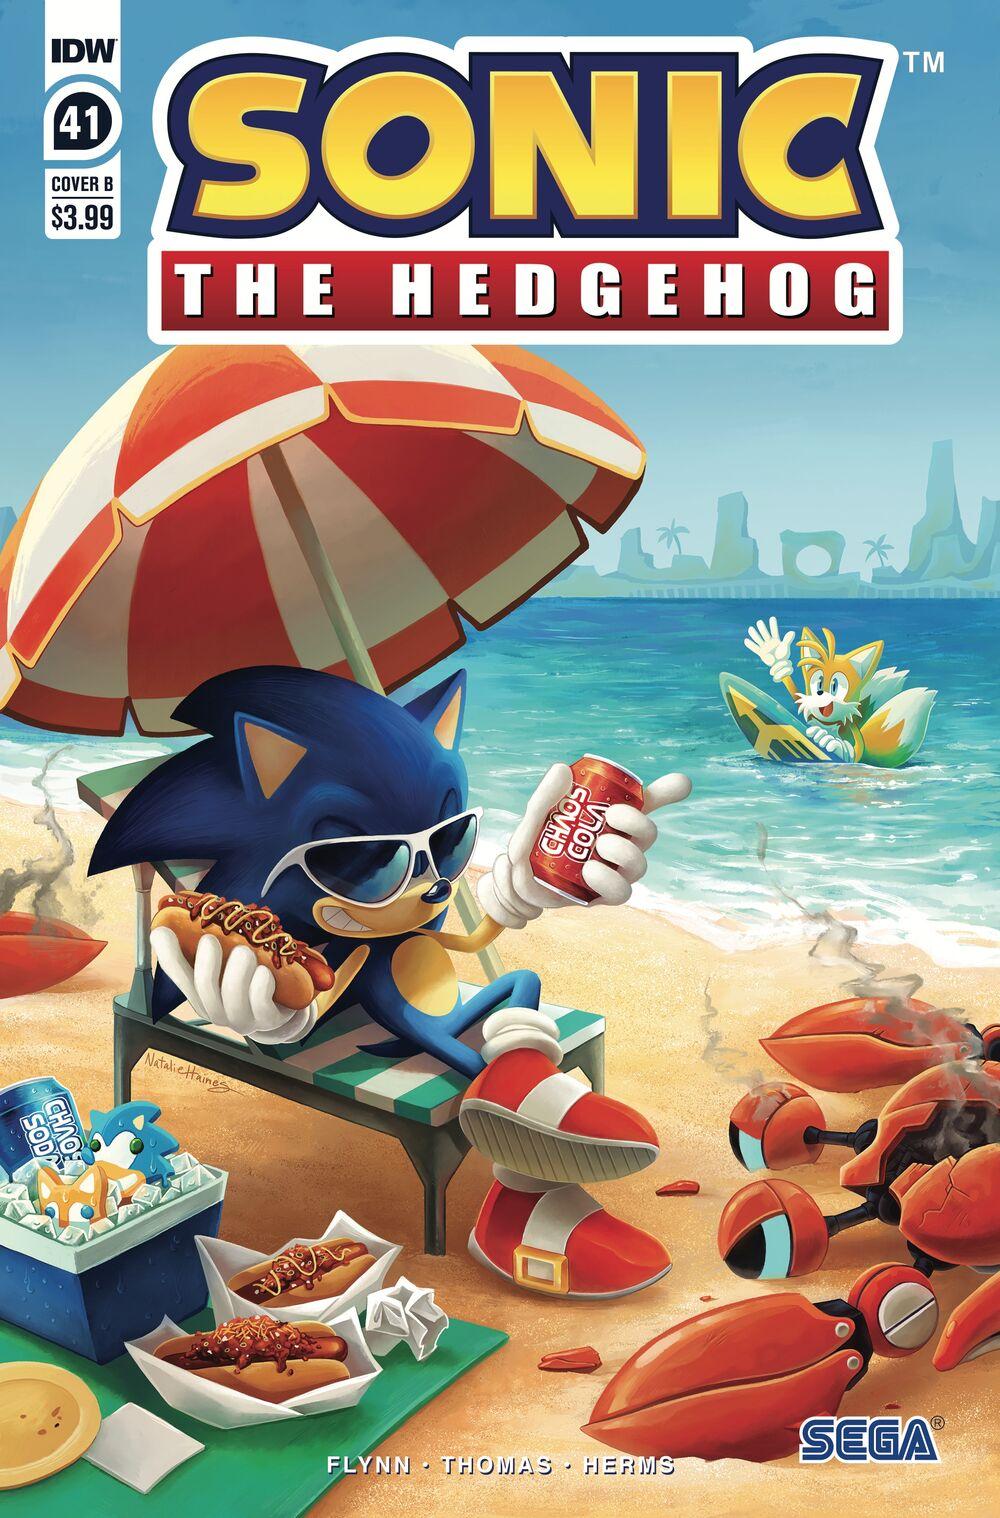 Sonic The Hedgehog #41 Cover B